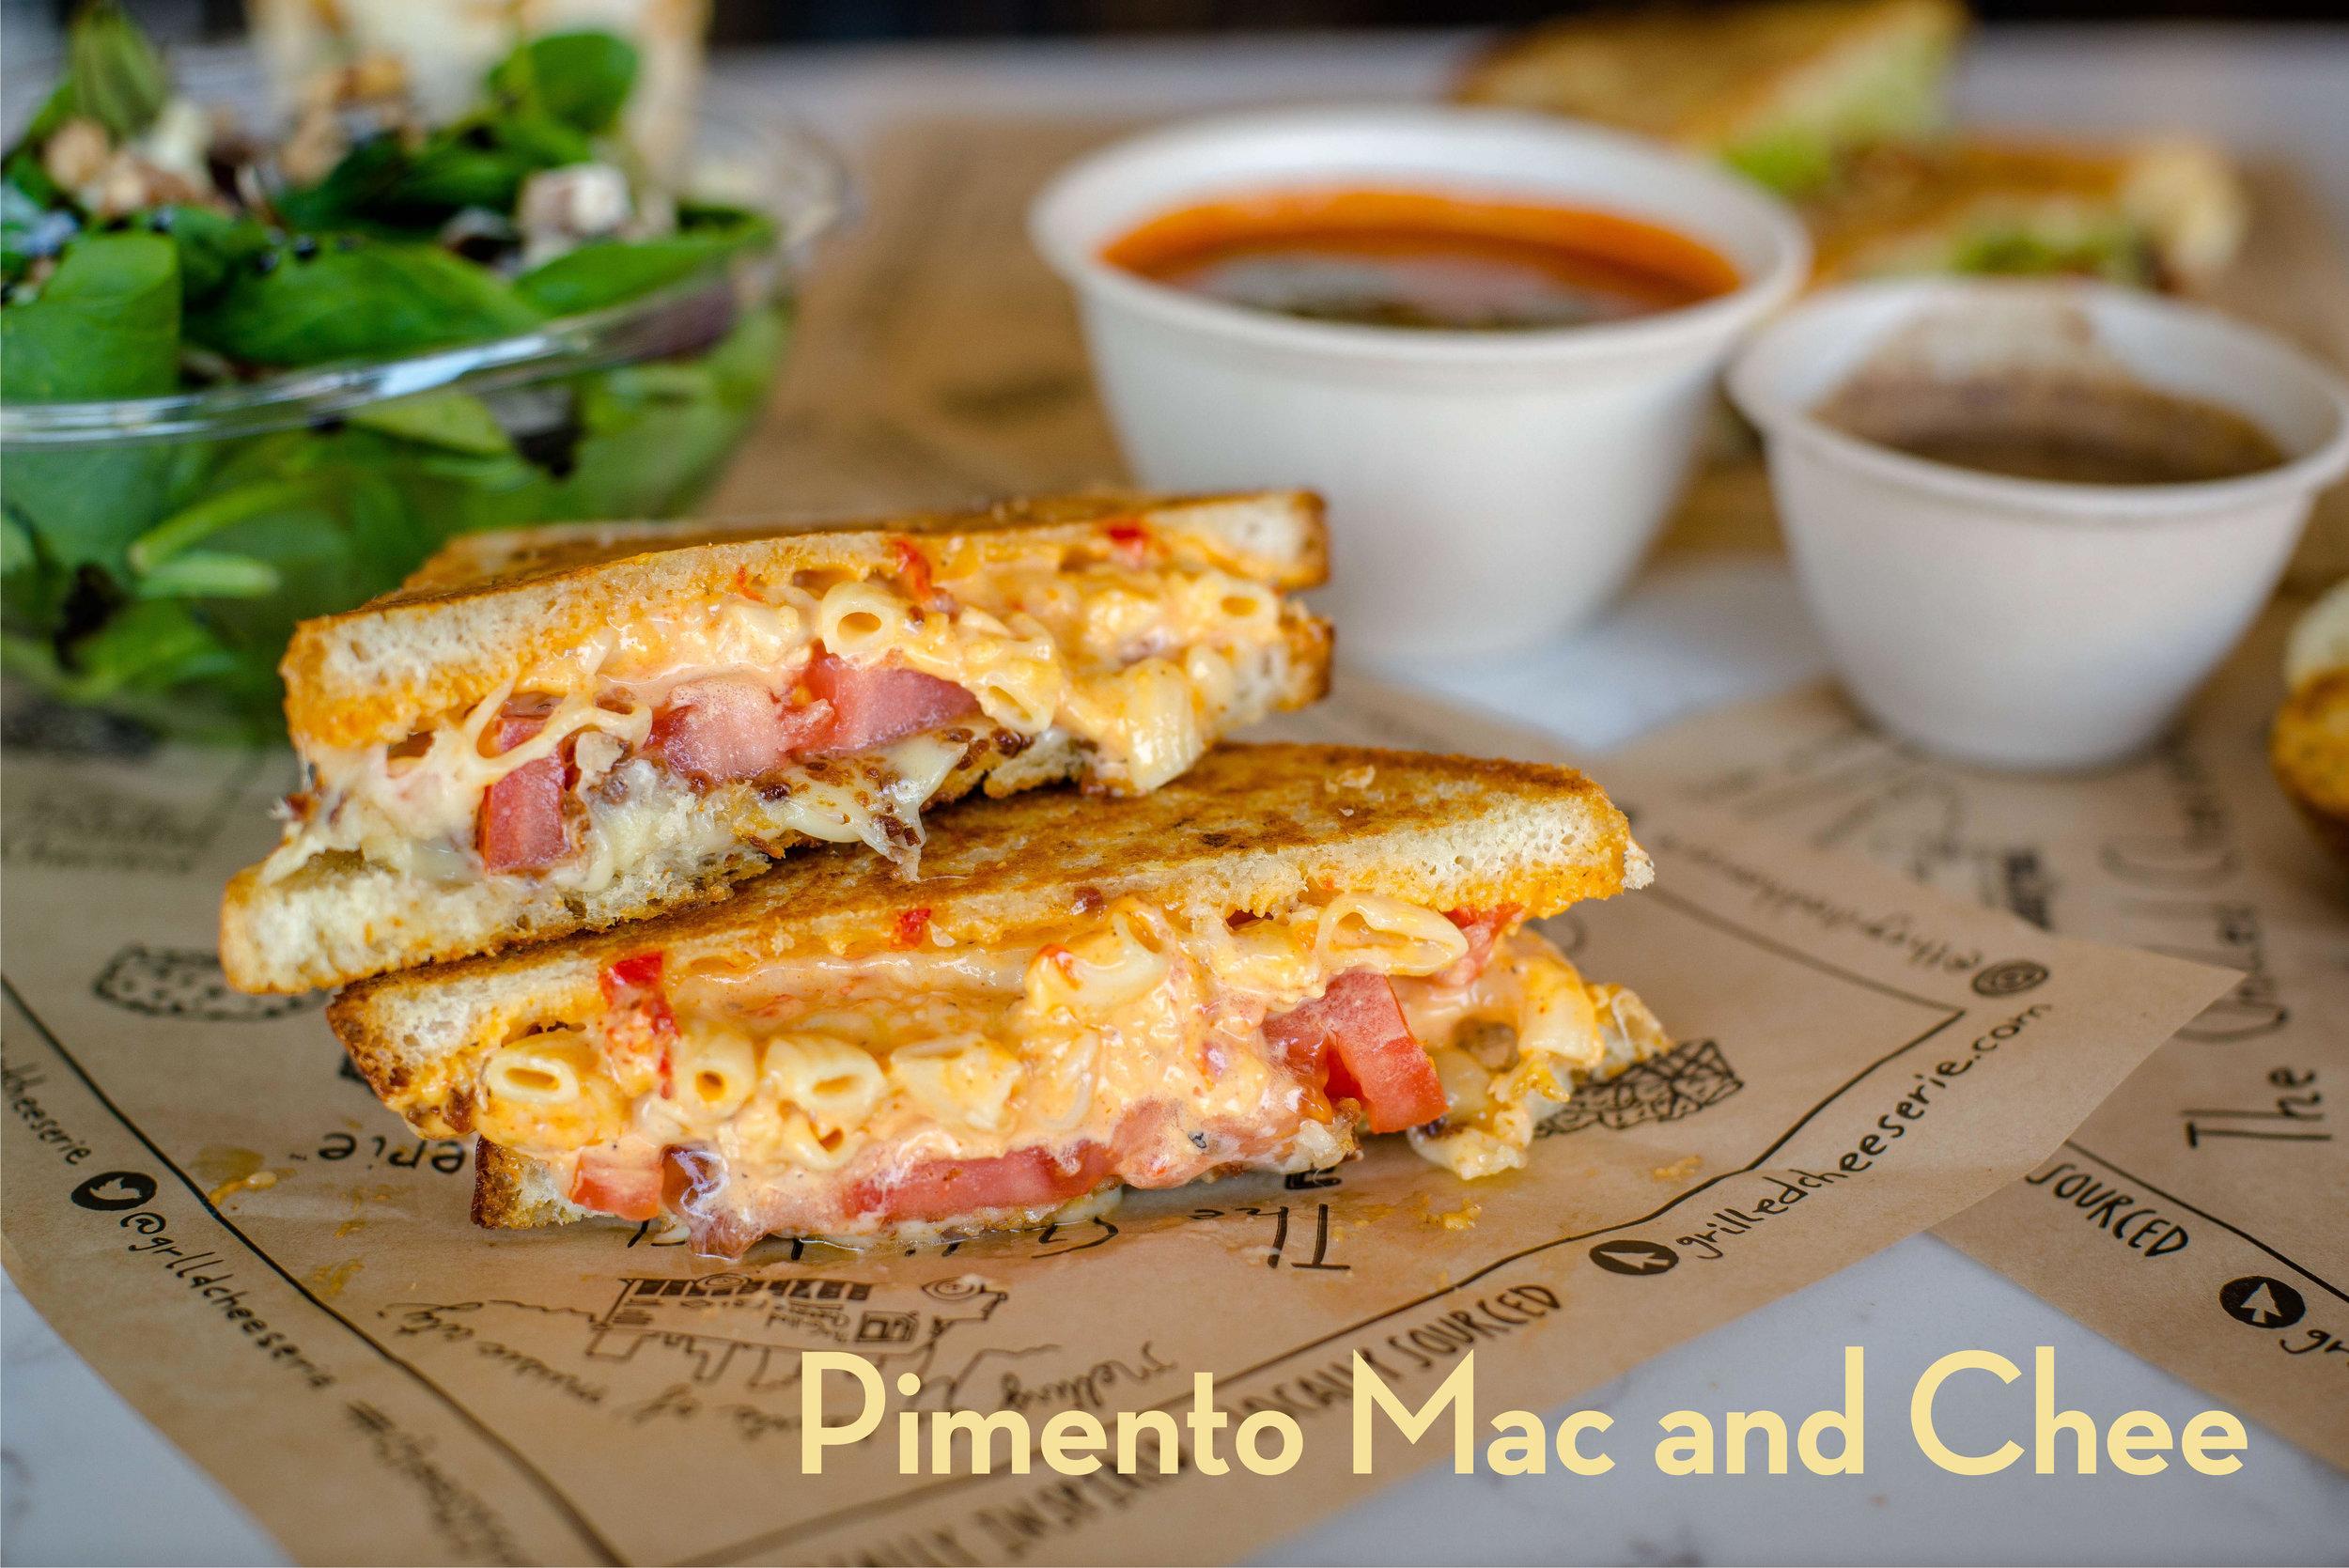 Pimento Mac and Chee